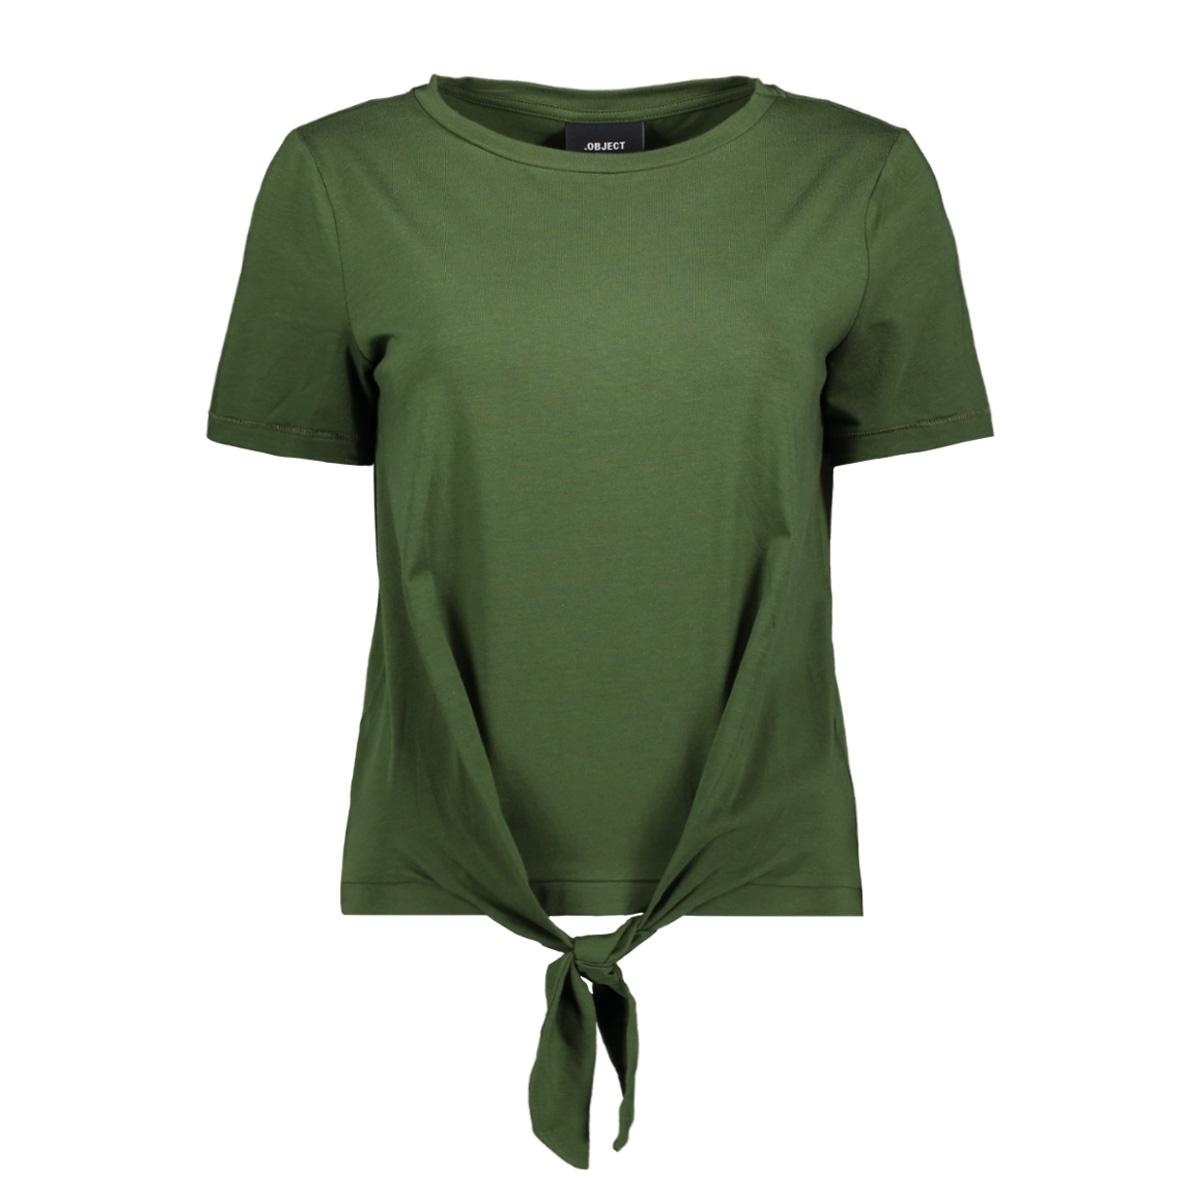 objstephanie maxwell s/s top season 23029400 object t-shirt black forest